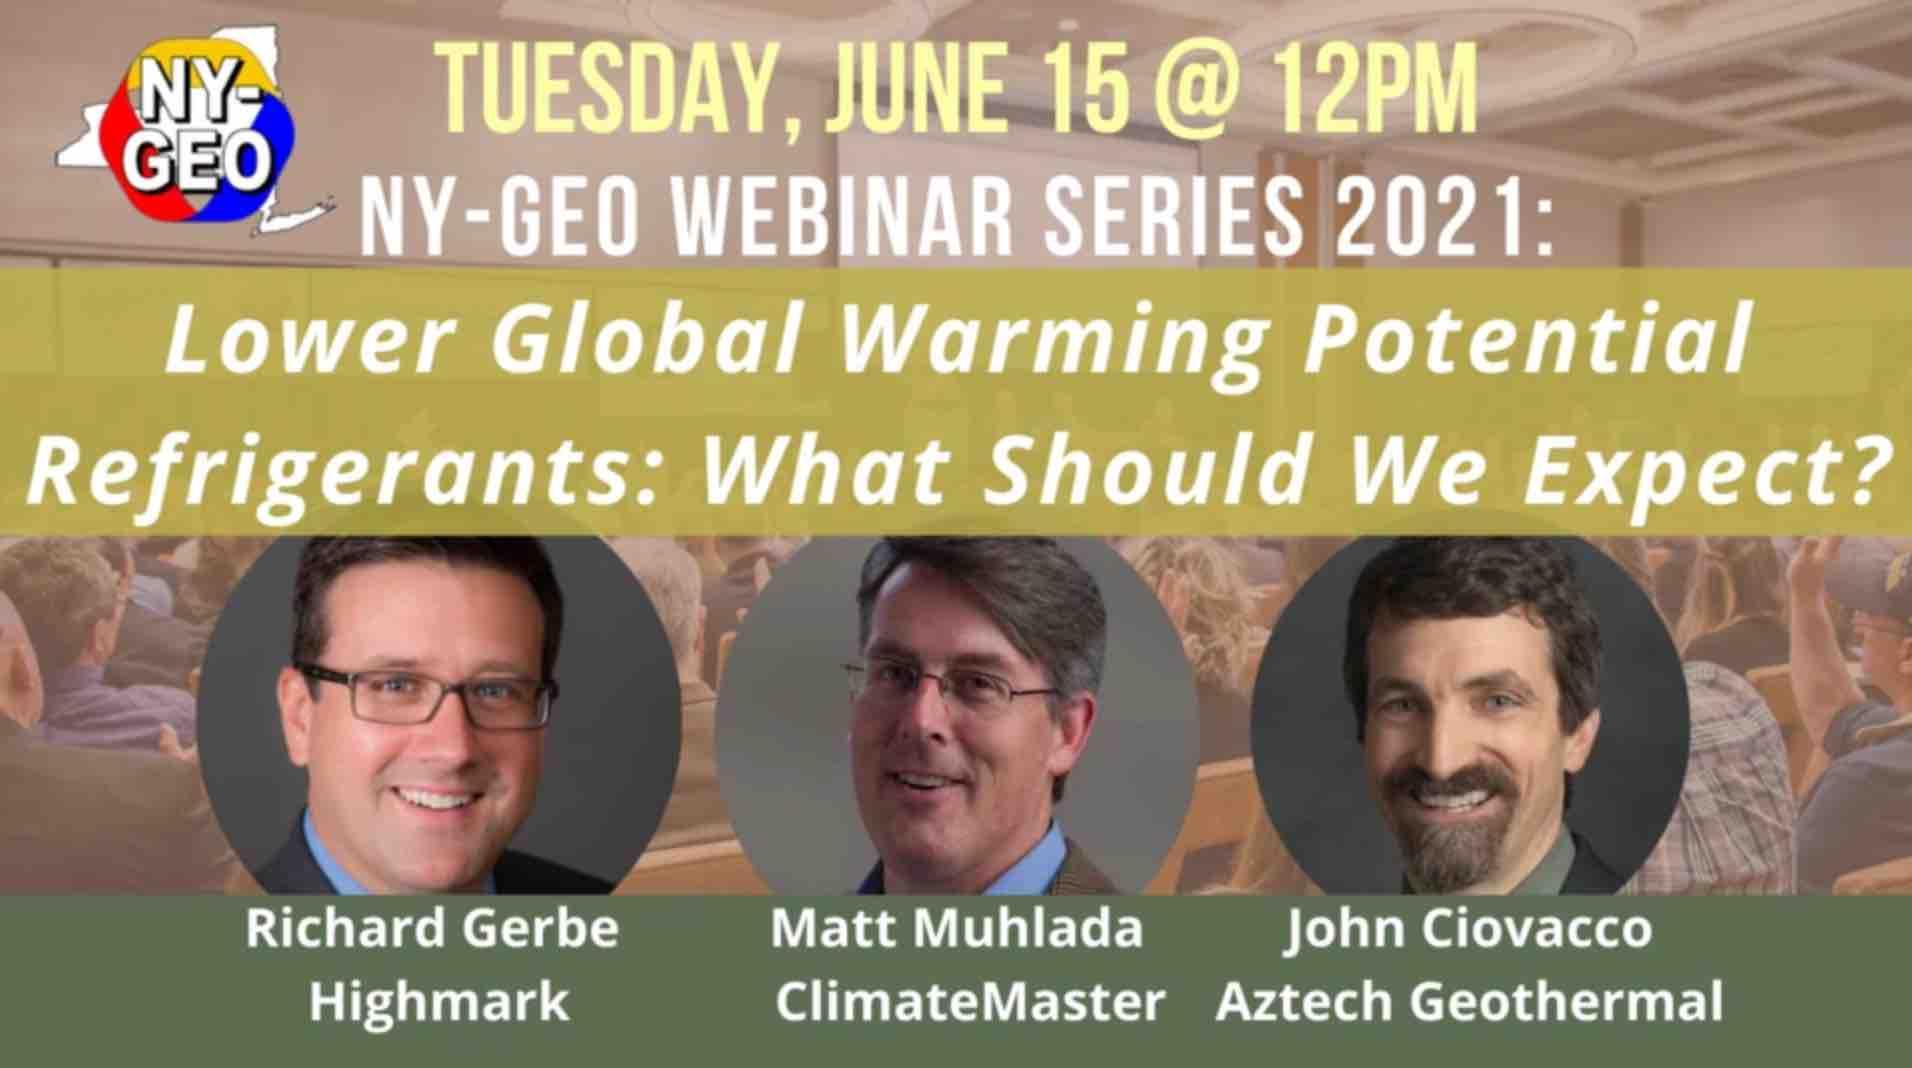 Refrigerants Presentation at NY-GEO 2021